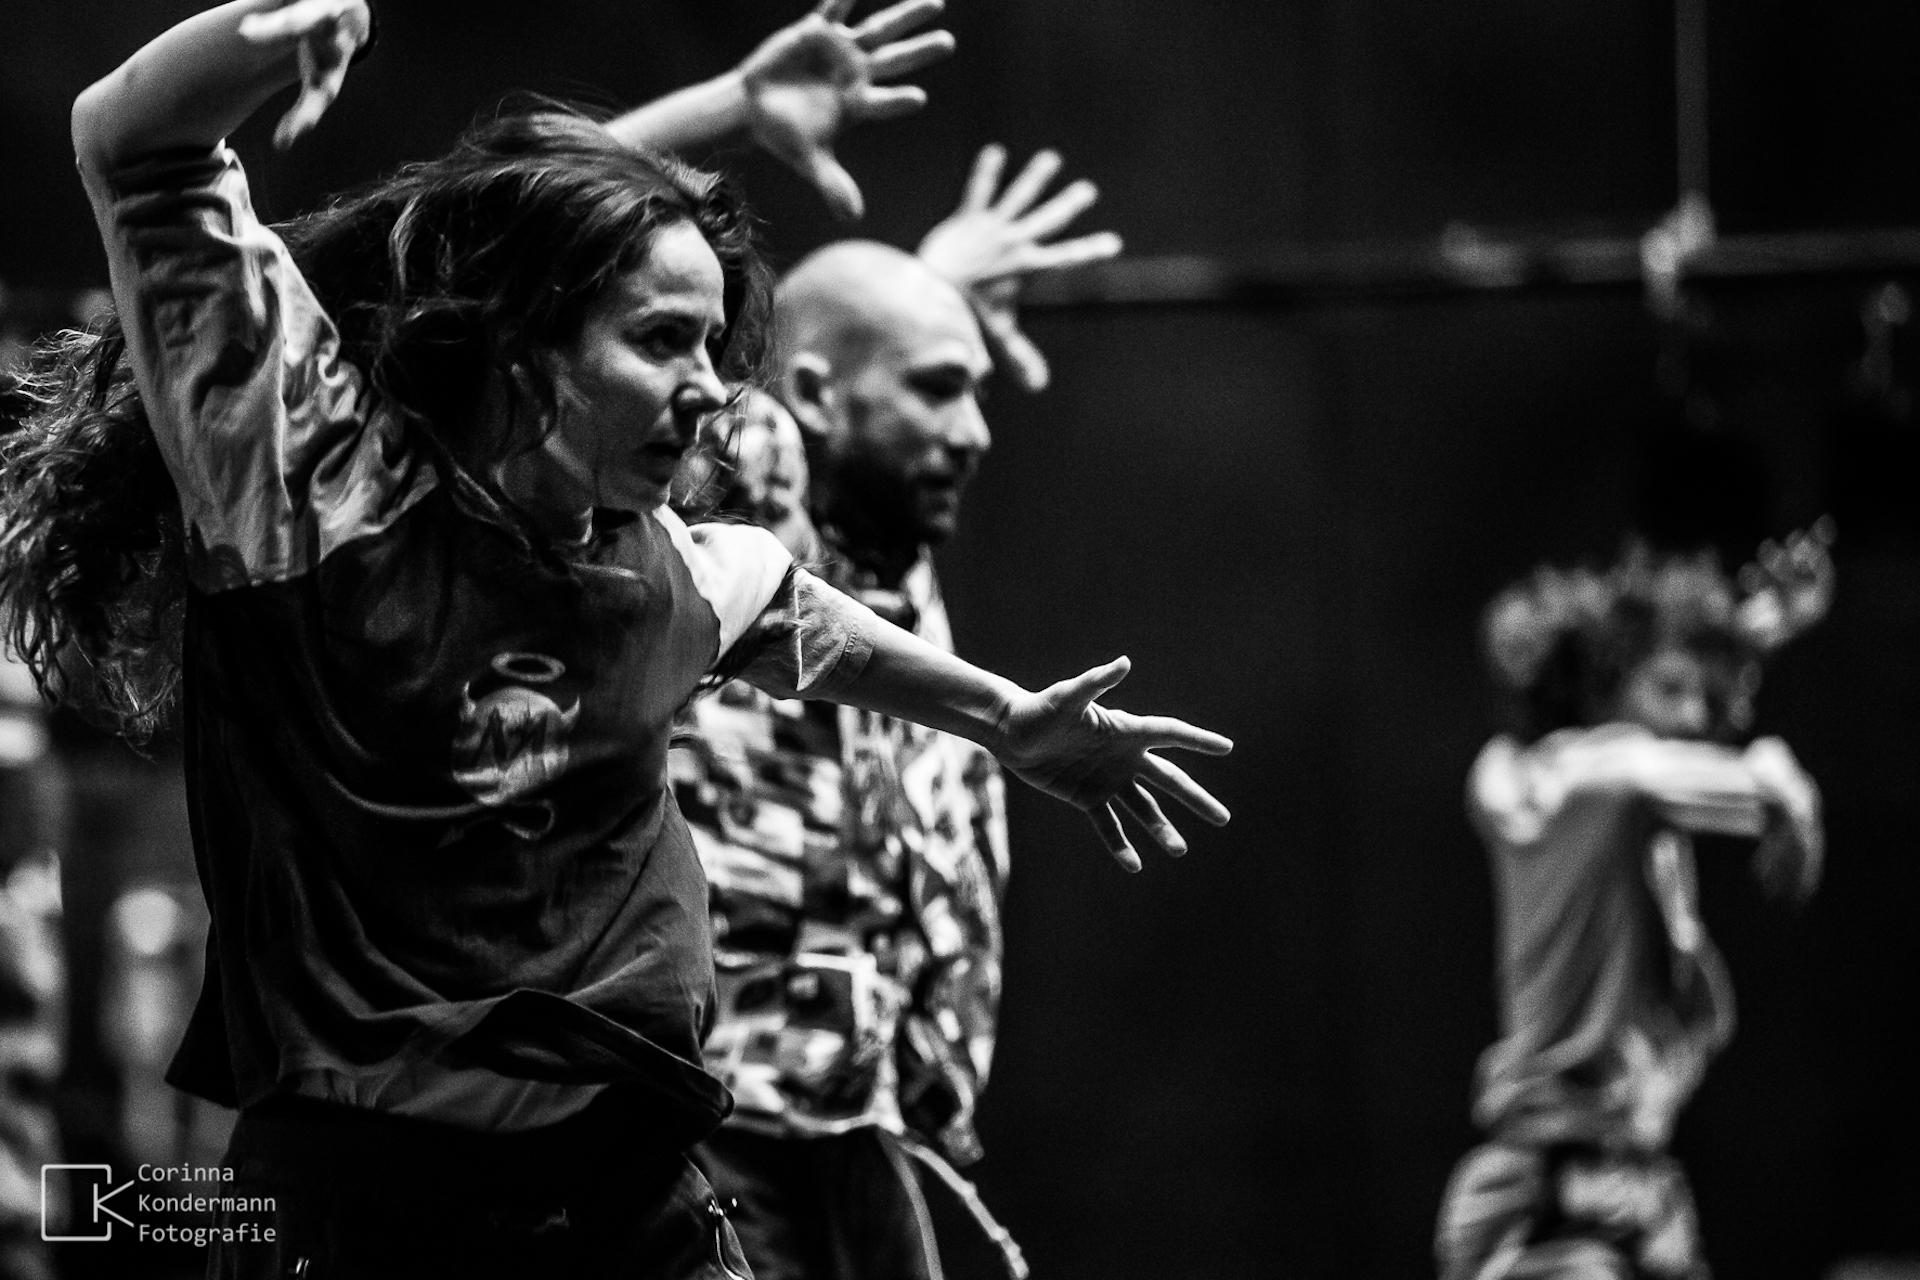 Christina Mertzani and Luca Gentini in Rehearsal from